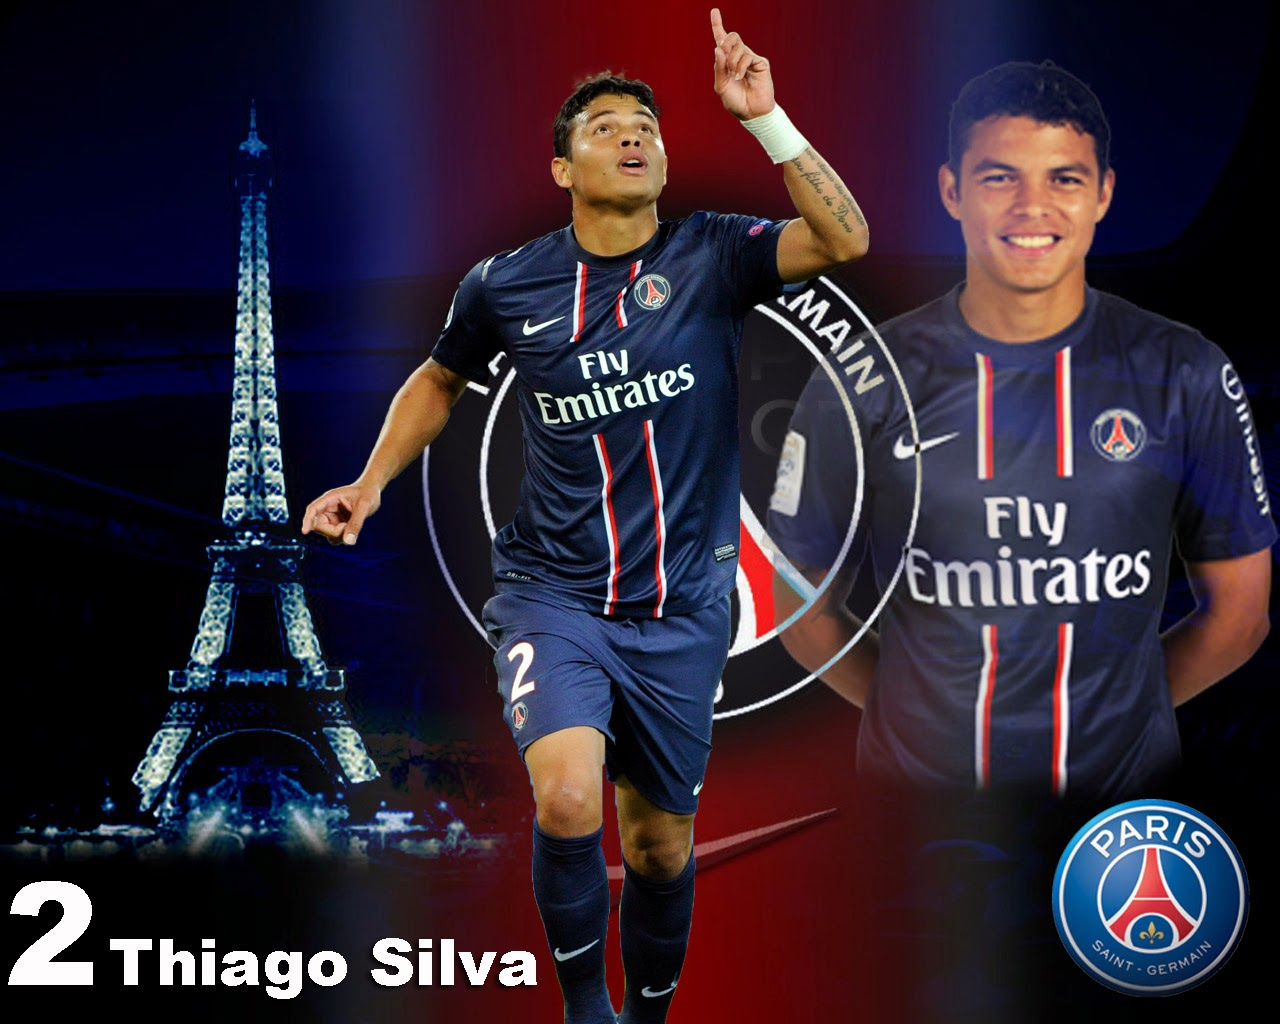 The New Best Player Top Thiago Silva PSG Wallpaper